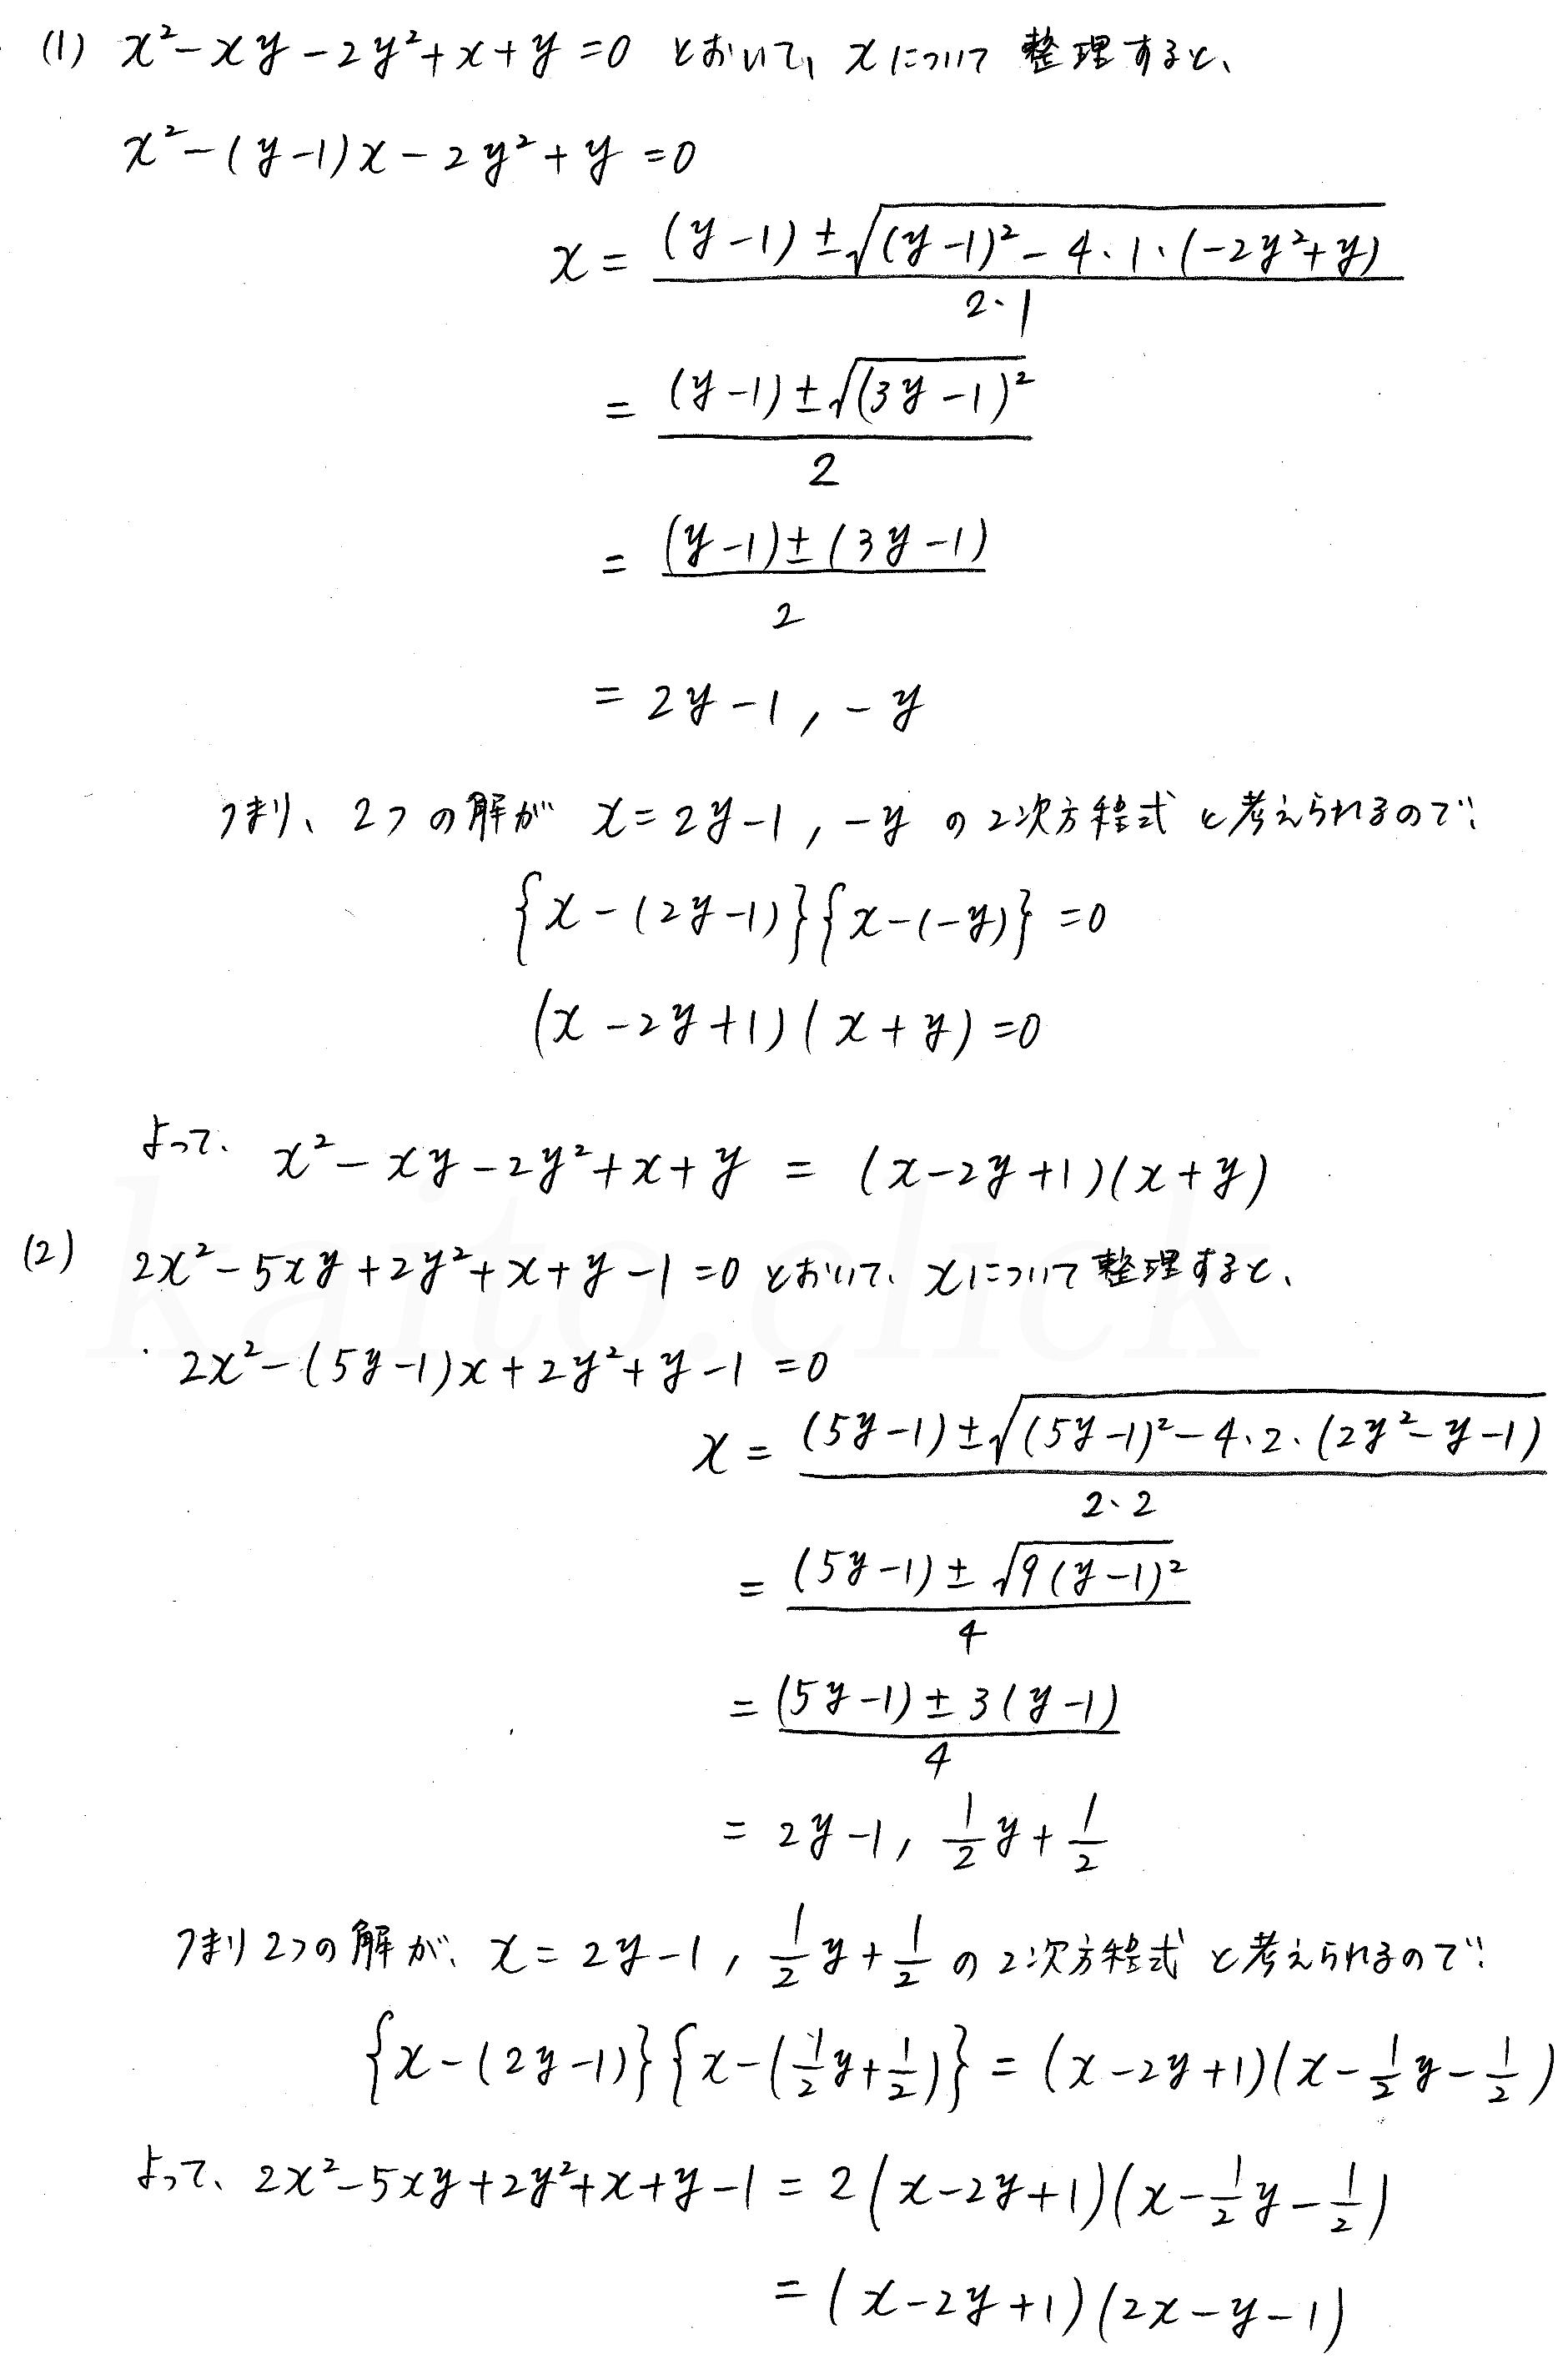 3TRIAL数学2-97解答